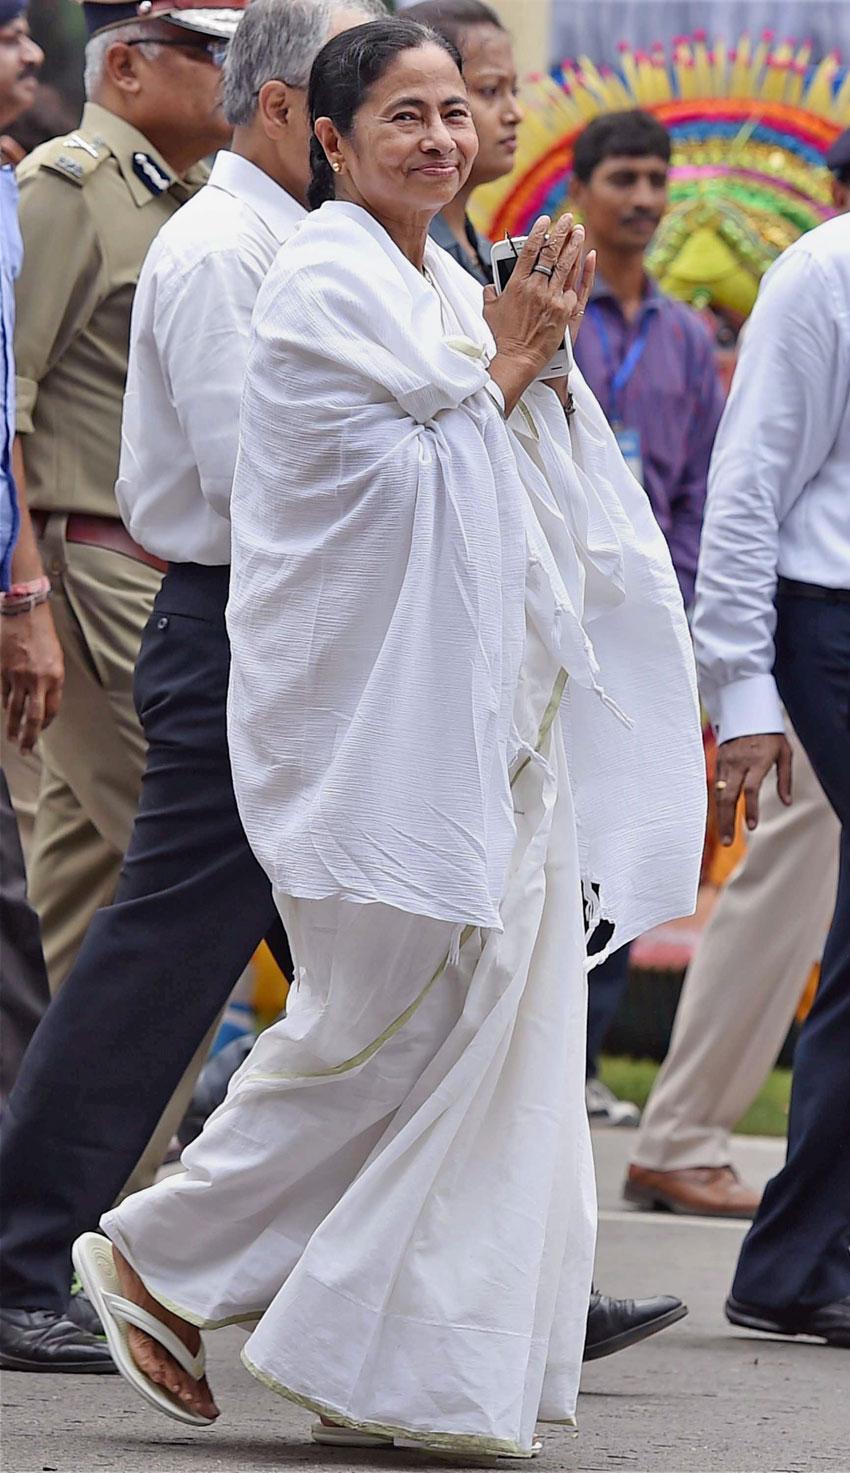 West Bengal Chief Minister Mamata Banerjee arrives at her swearing in ceremony in Kolkata, May 27. (Ashok Bhaumik | PTI)